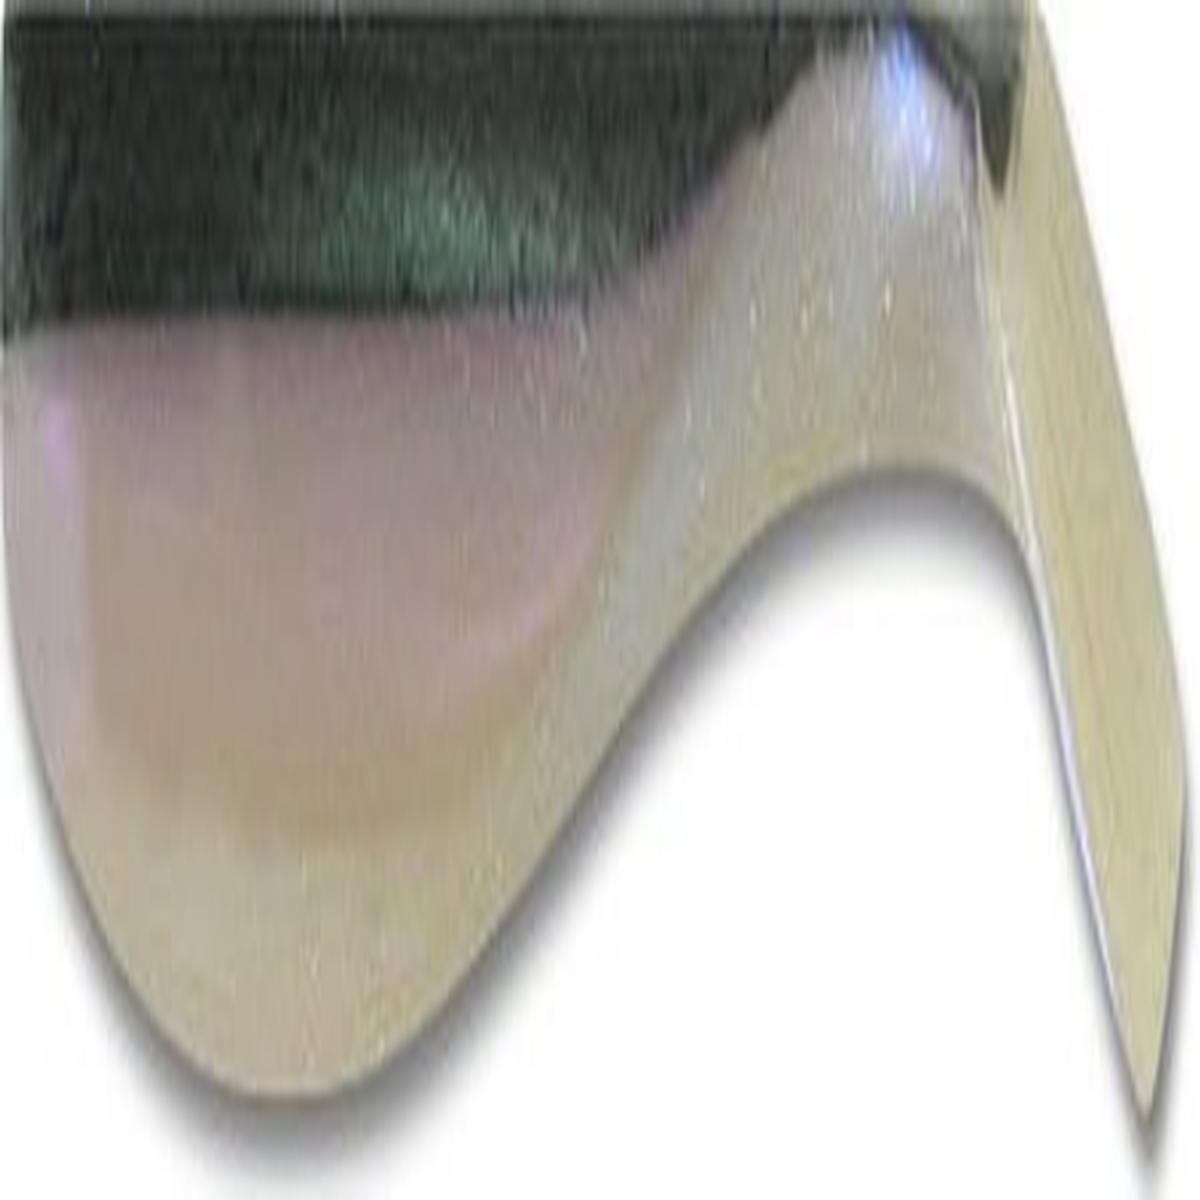 Stens 125-864 Fill Cap Replaces Wacker 0119626